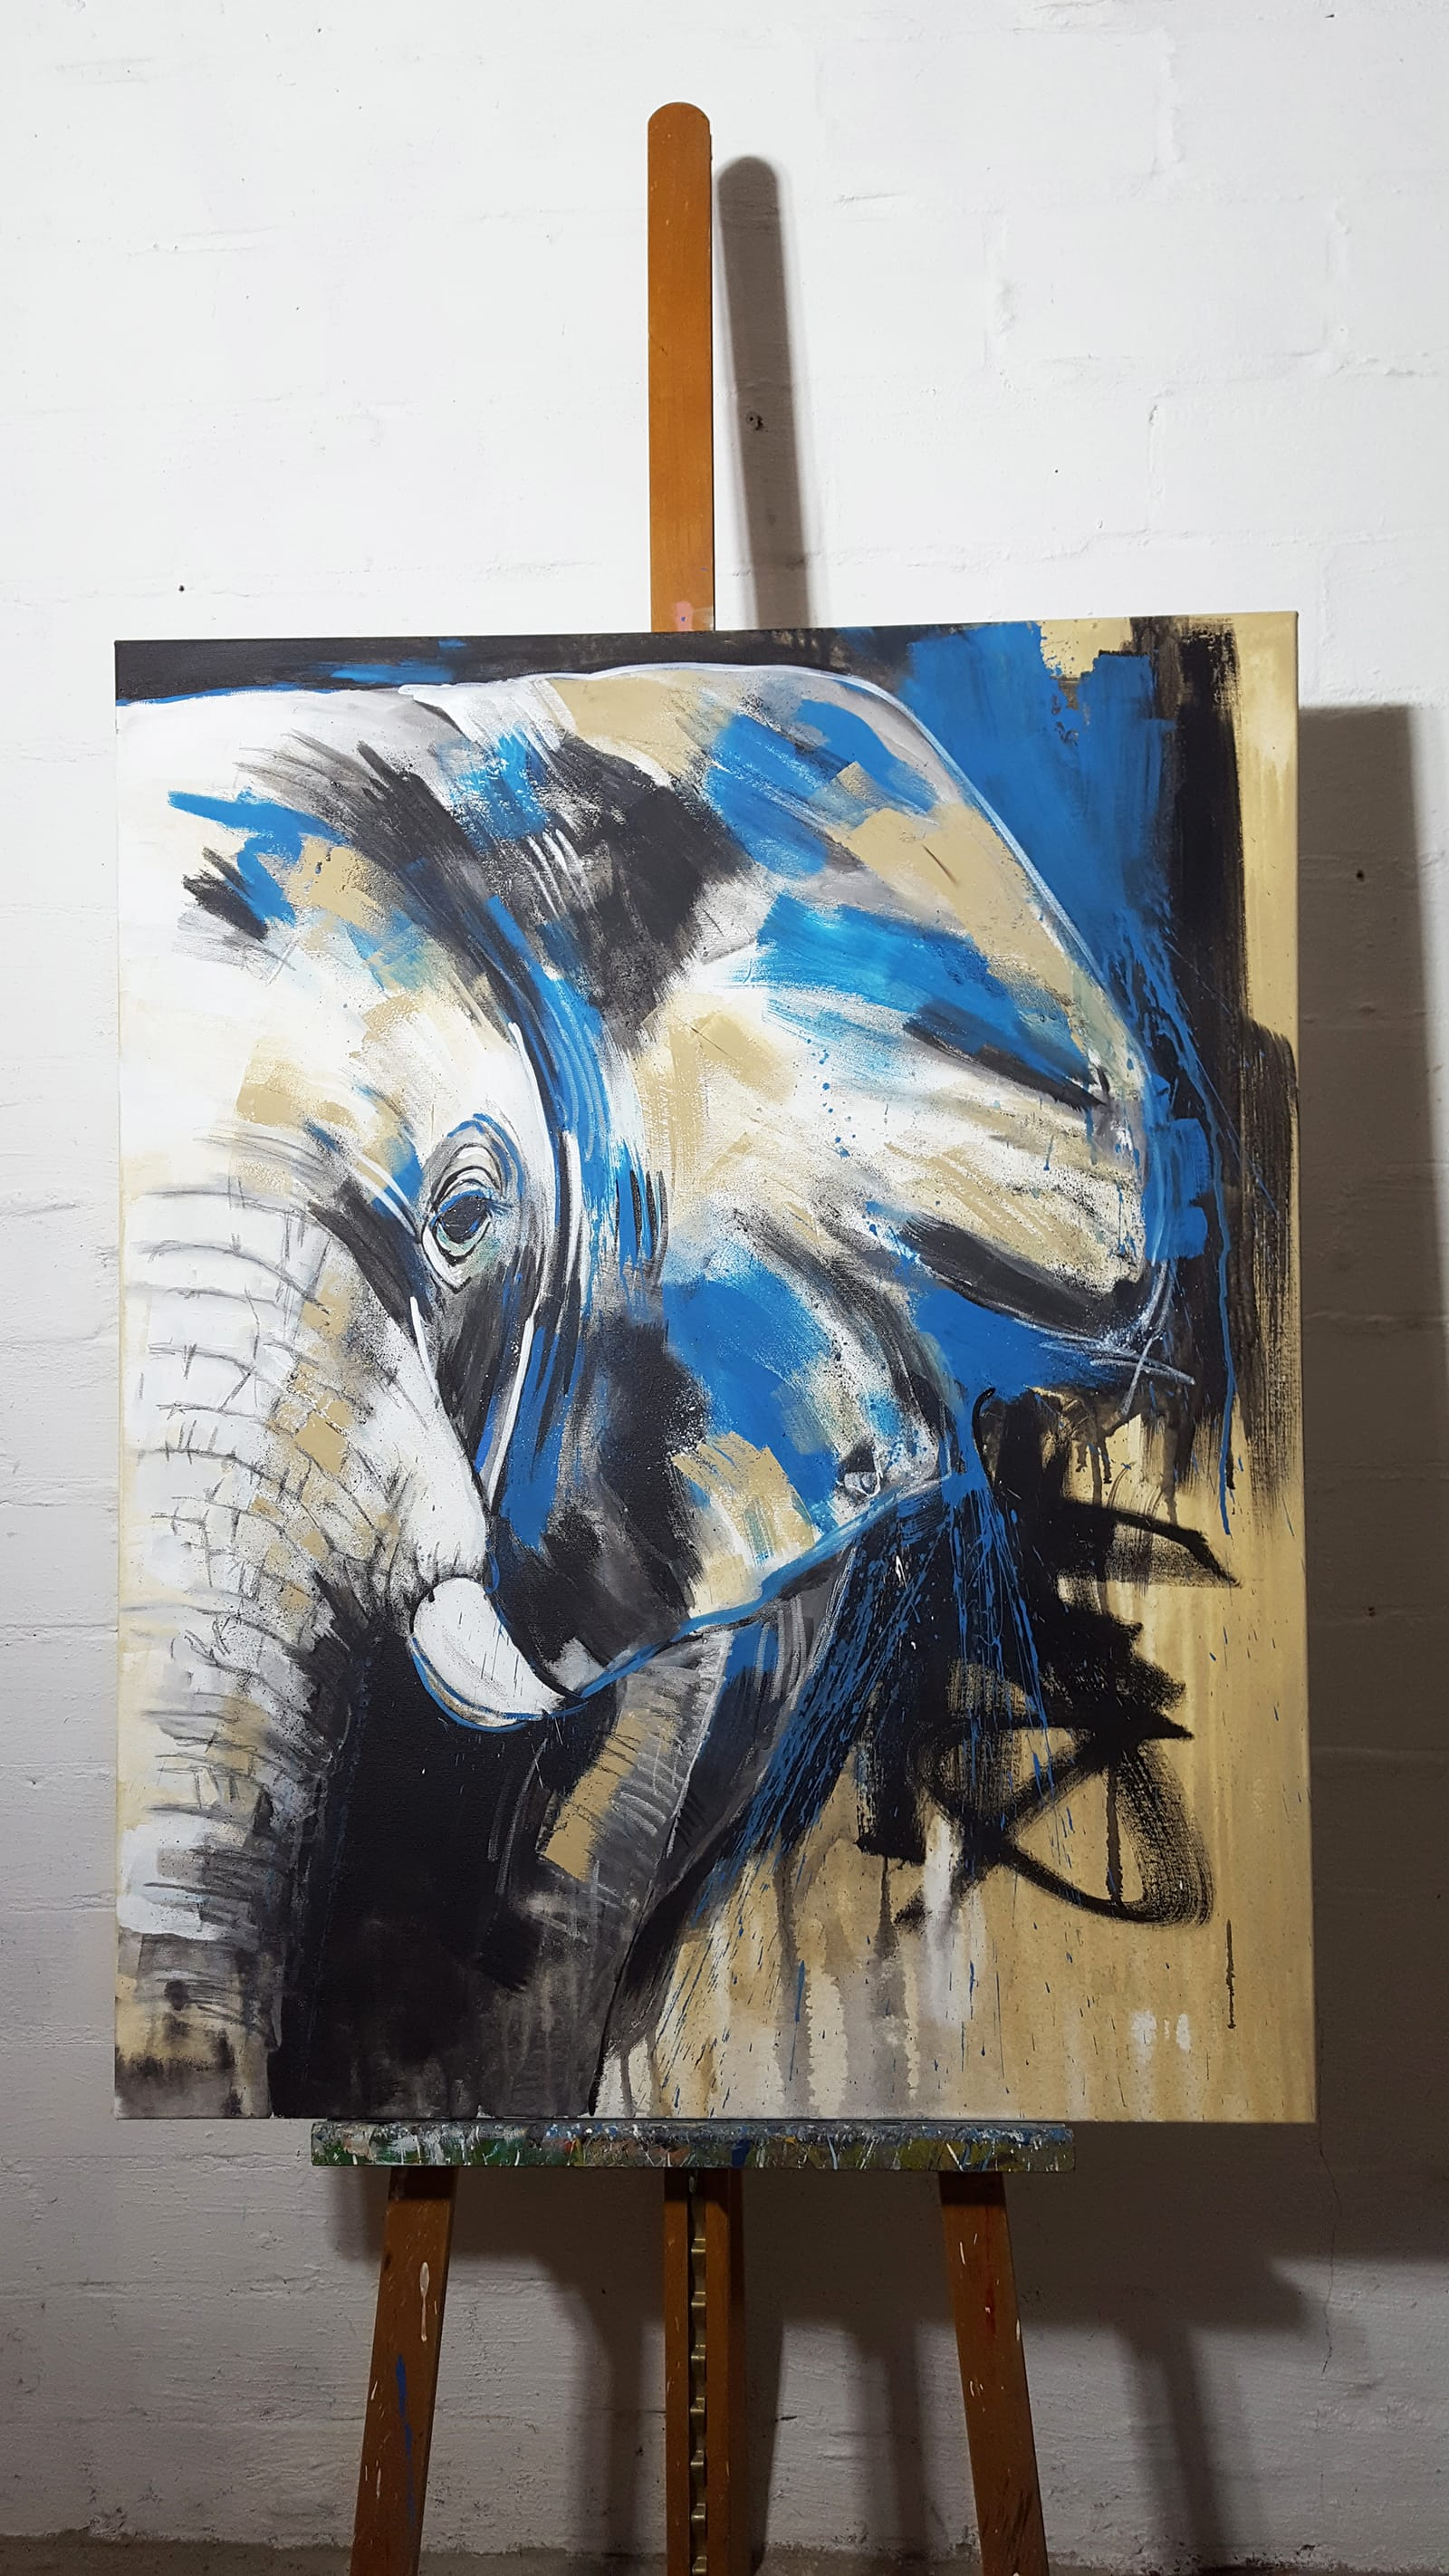 Elefant #6 auf Staffelei